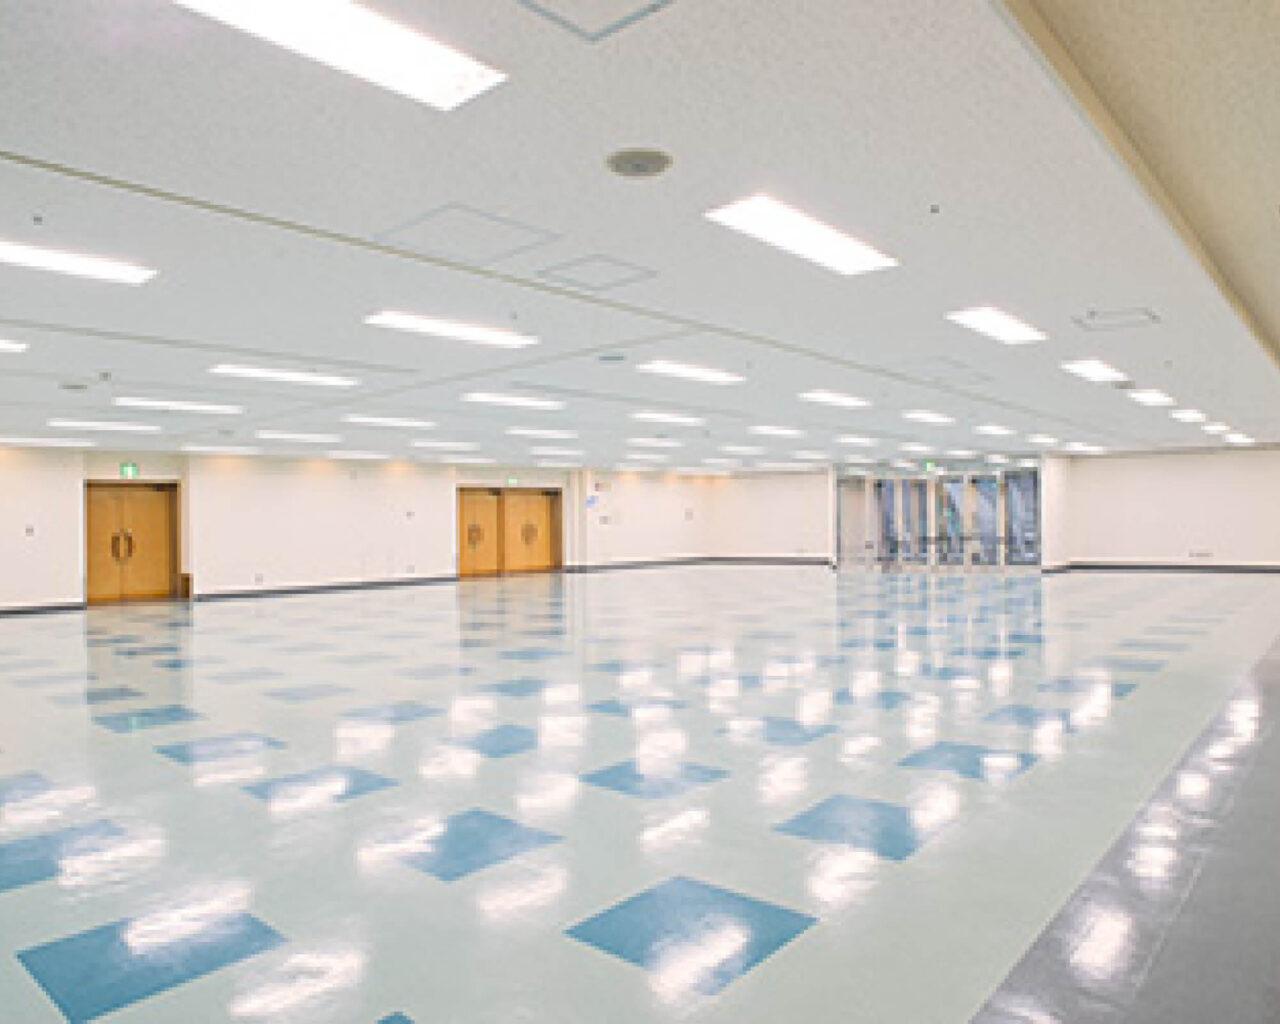 https://www.shizuoka-cb.com/wp-content/uploads/2021/03/photo-venues13-1280x1024.jpg